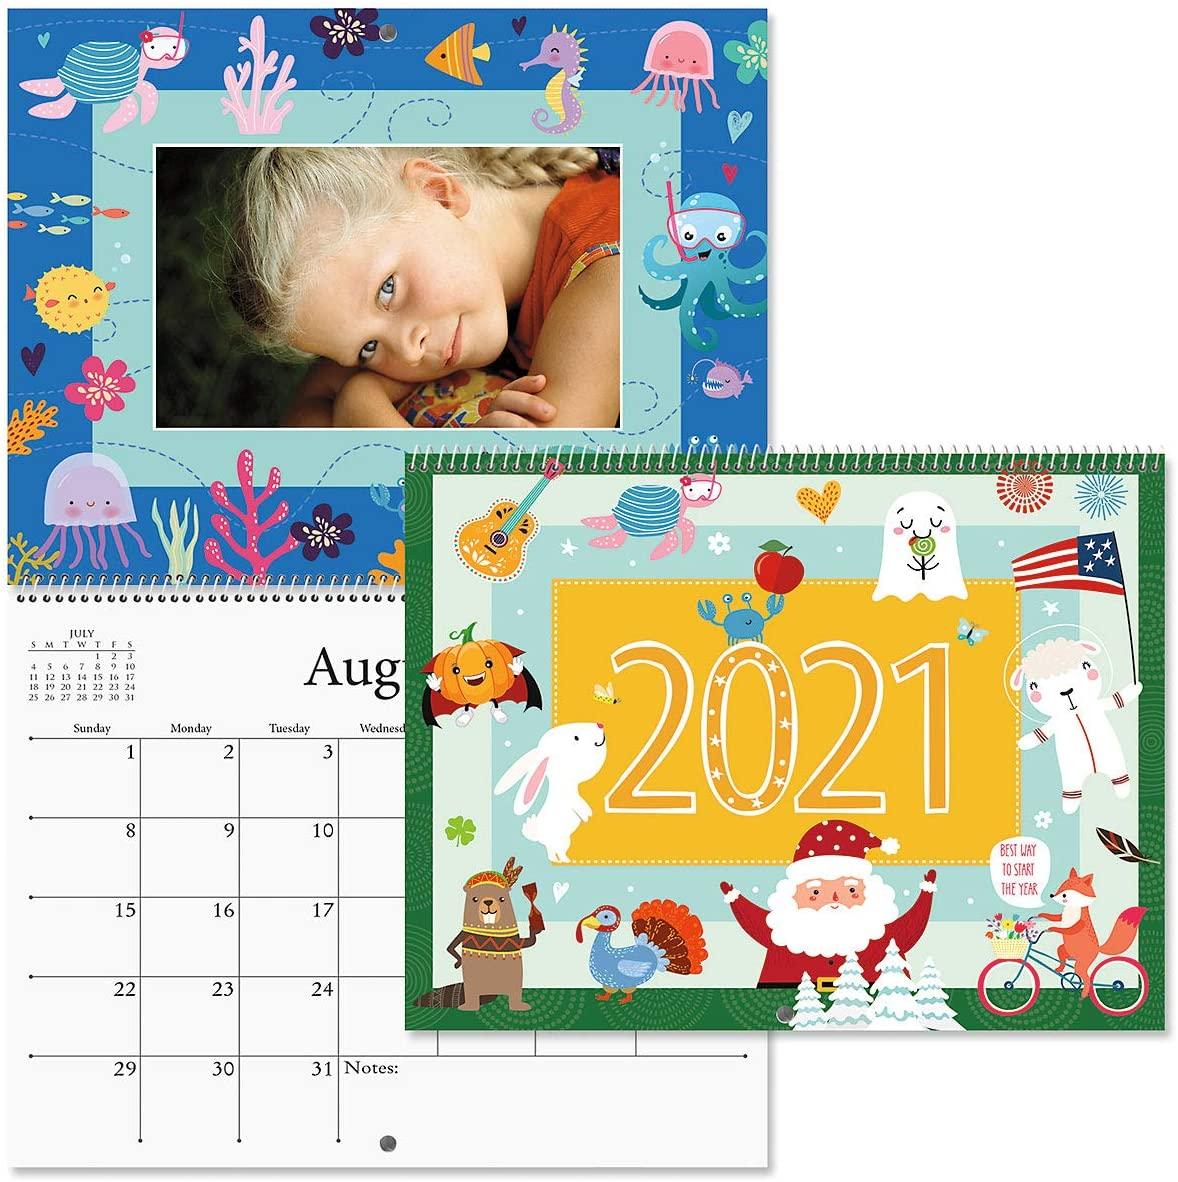 2021 Graphic Photo Calendar - 8-3/4